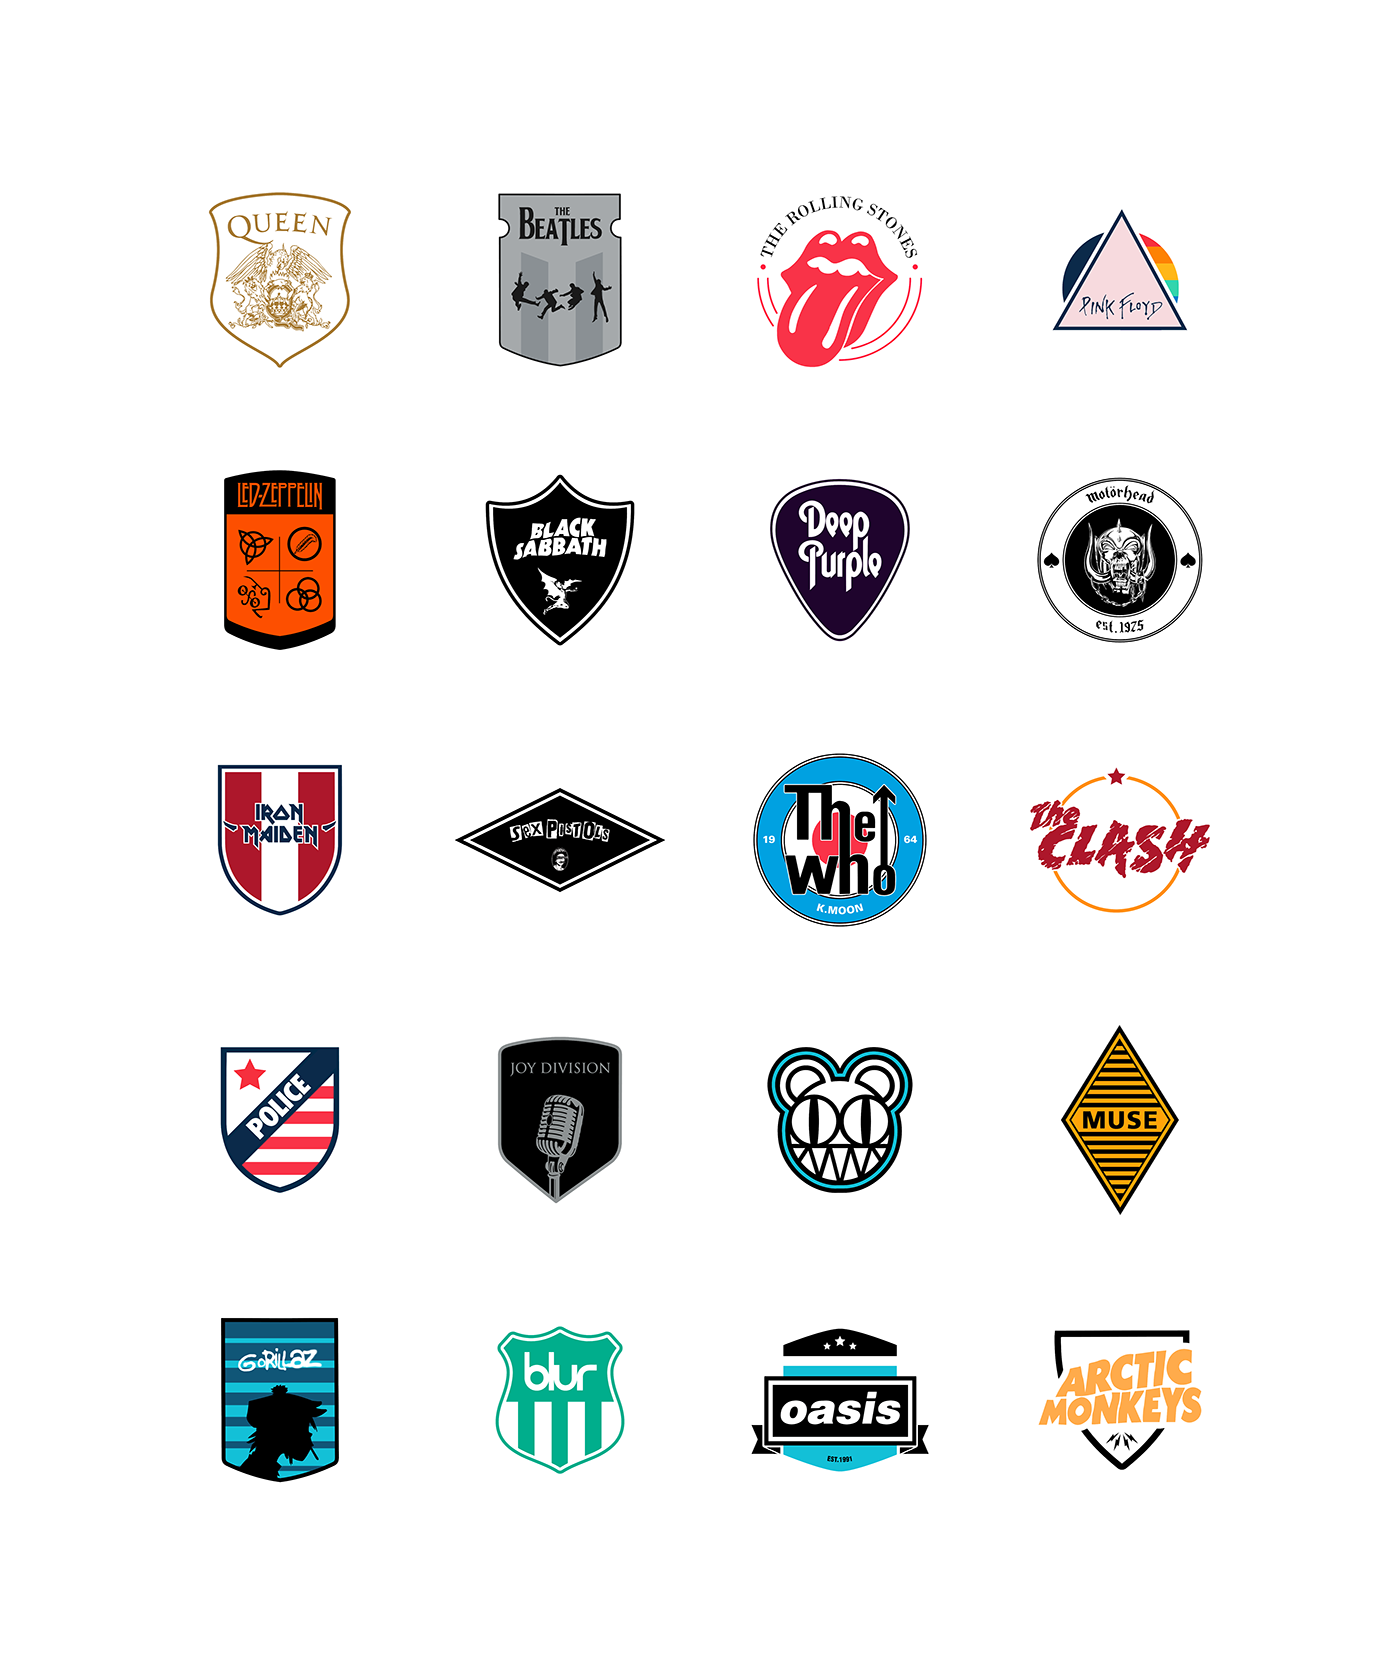 Premier League football soccer rock sports uniform uniforme Badges Escudos futebol